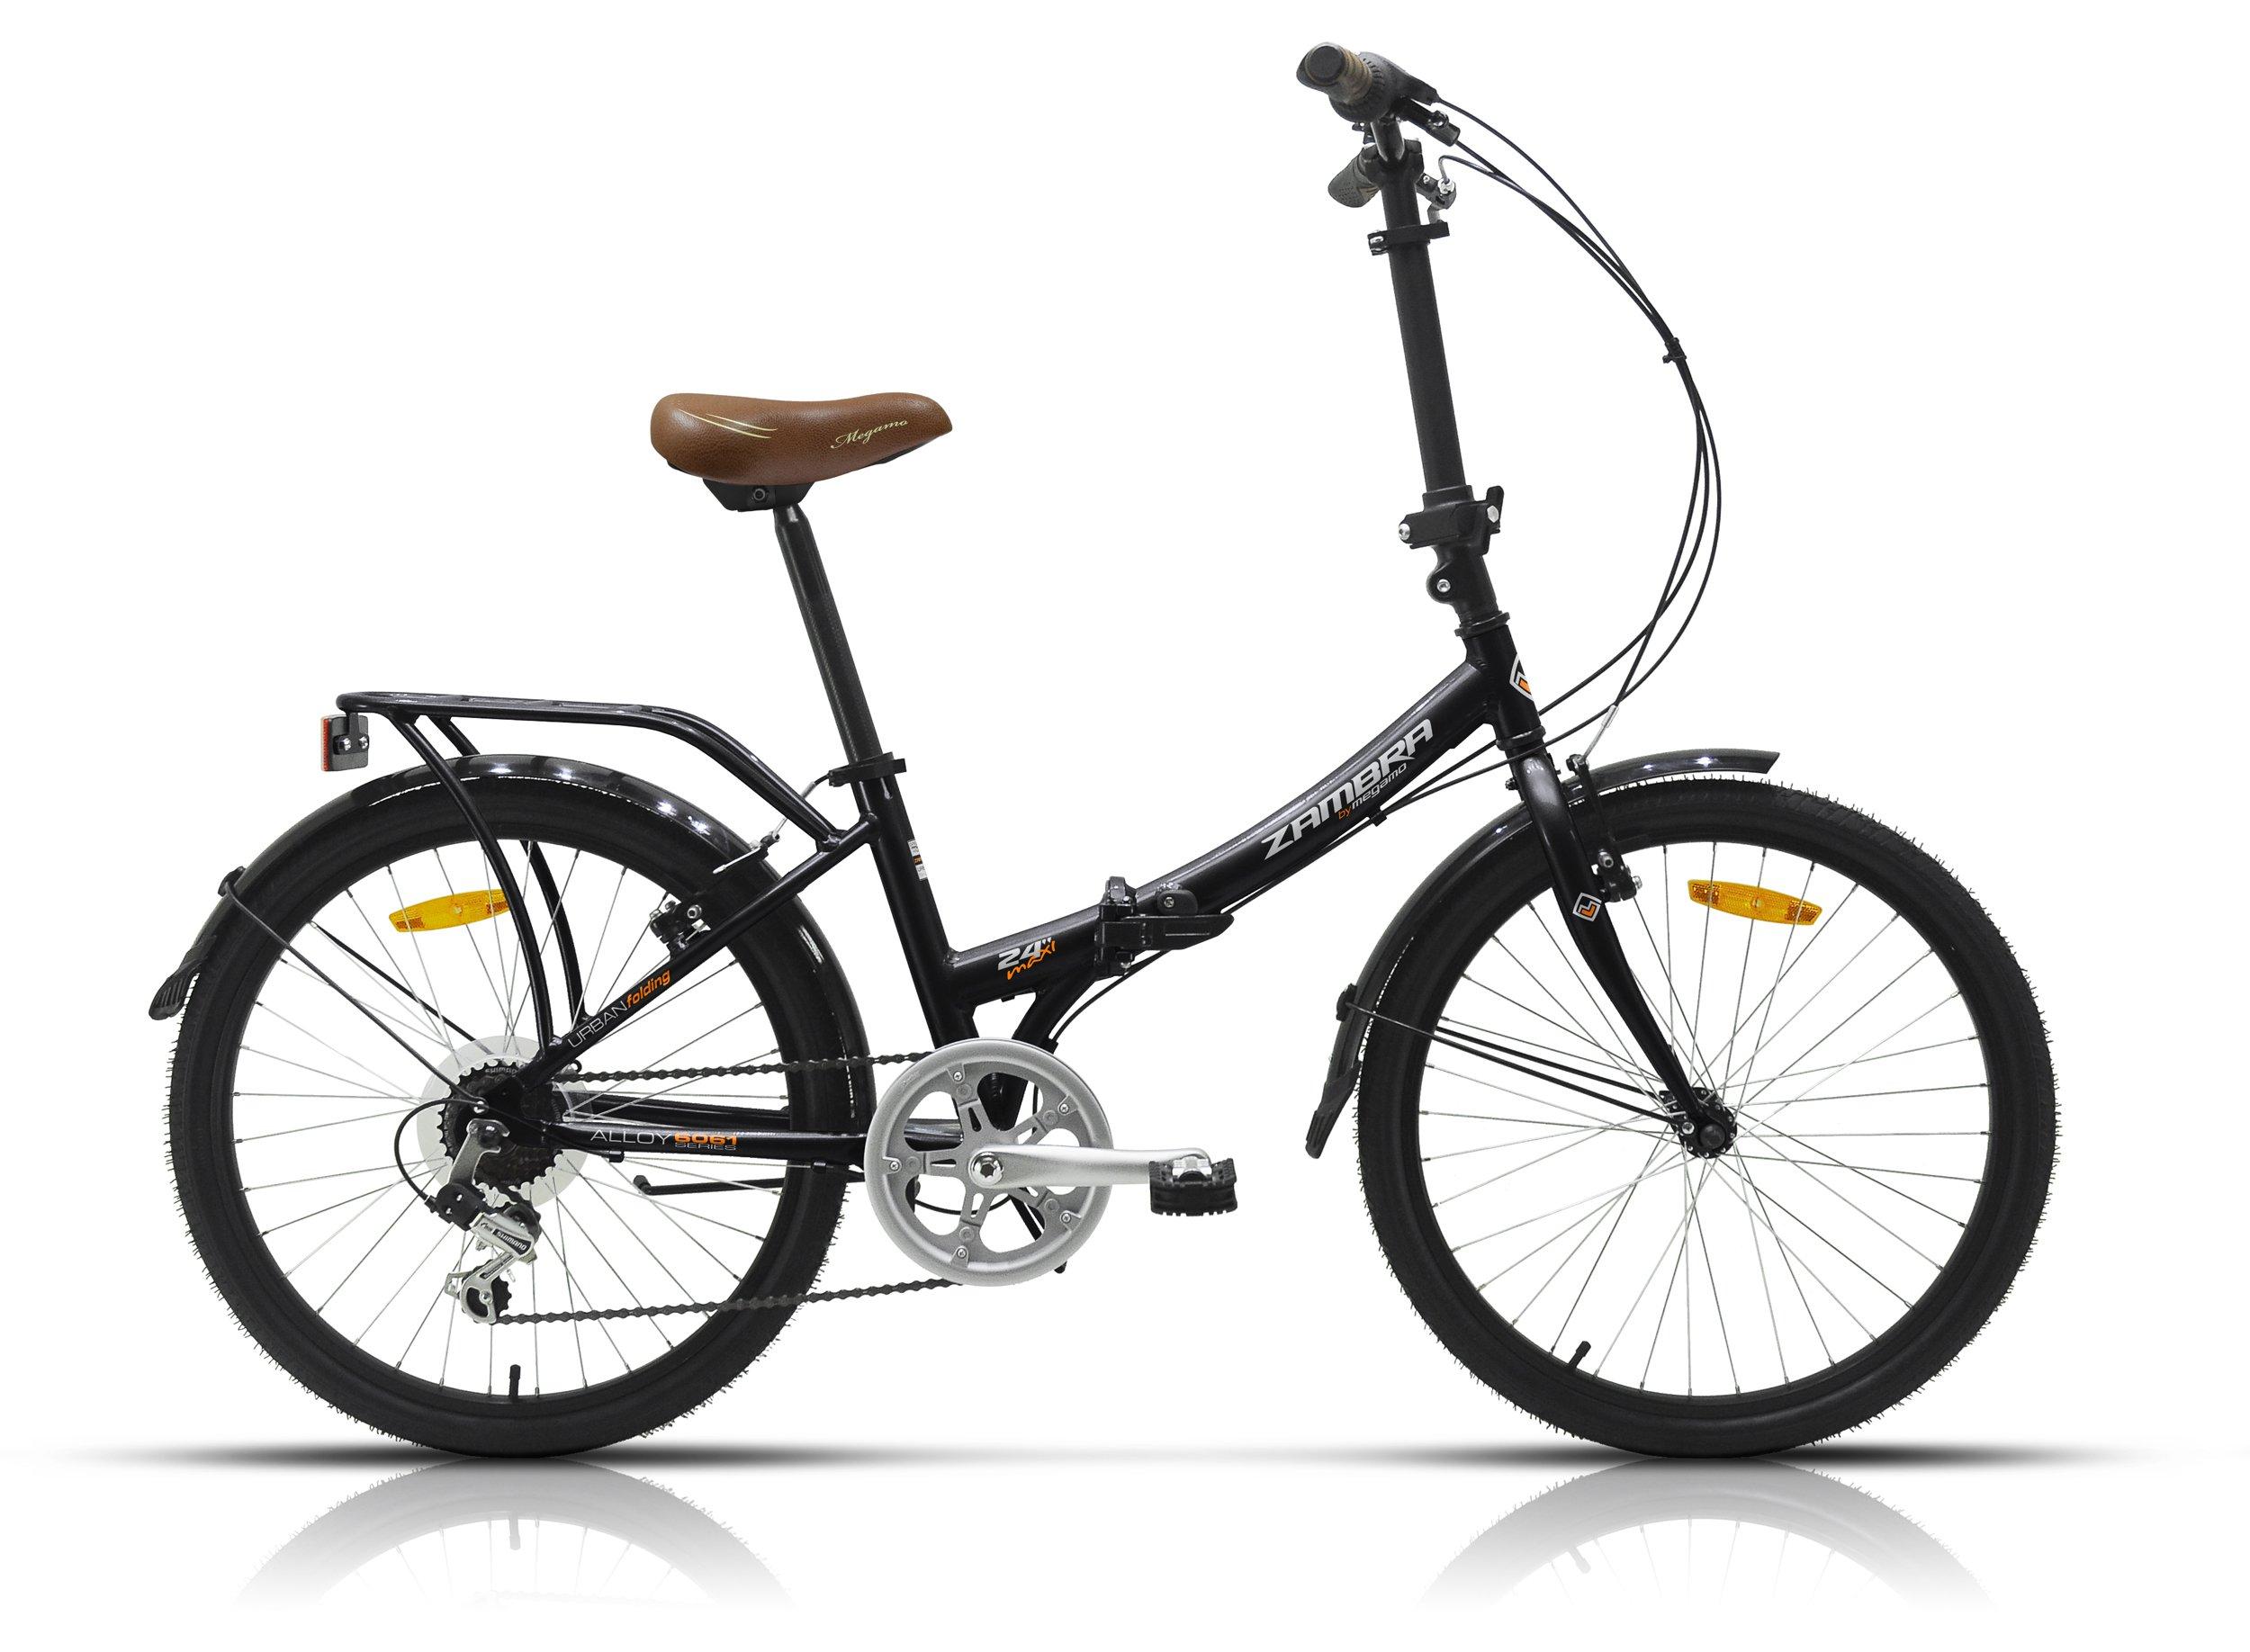 Megamo Maxi Bicicleta Plegable de Paseo, Unisex Adulto, Negro, M ...